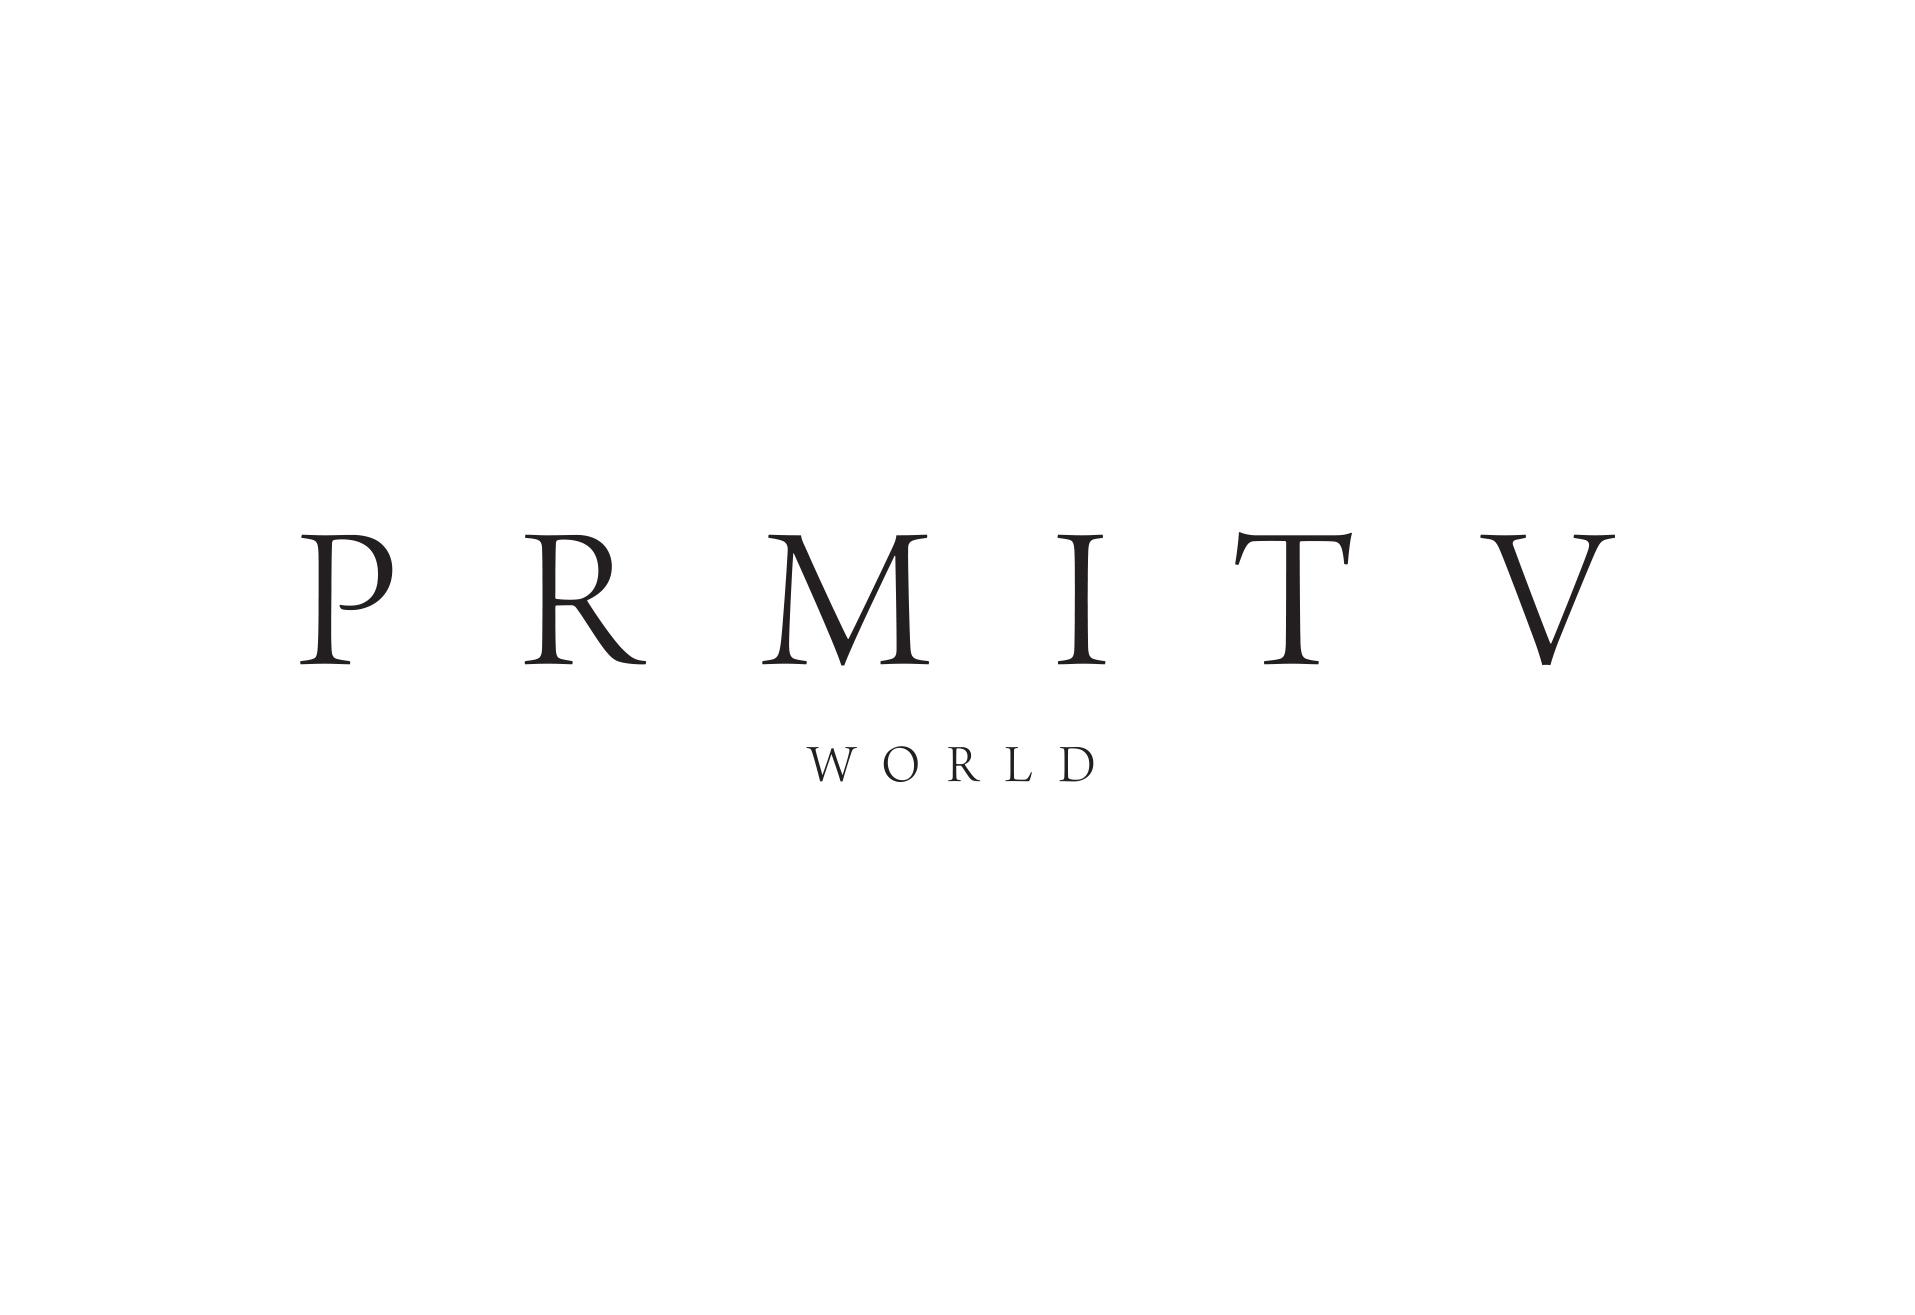 PRMITV WORLD